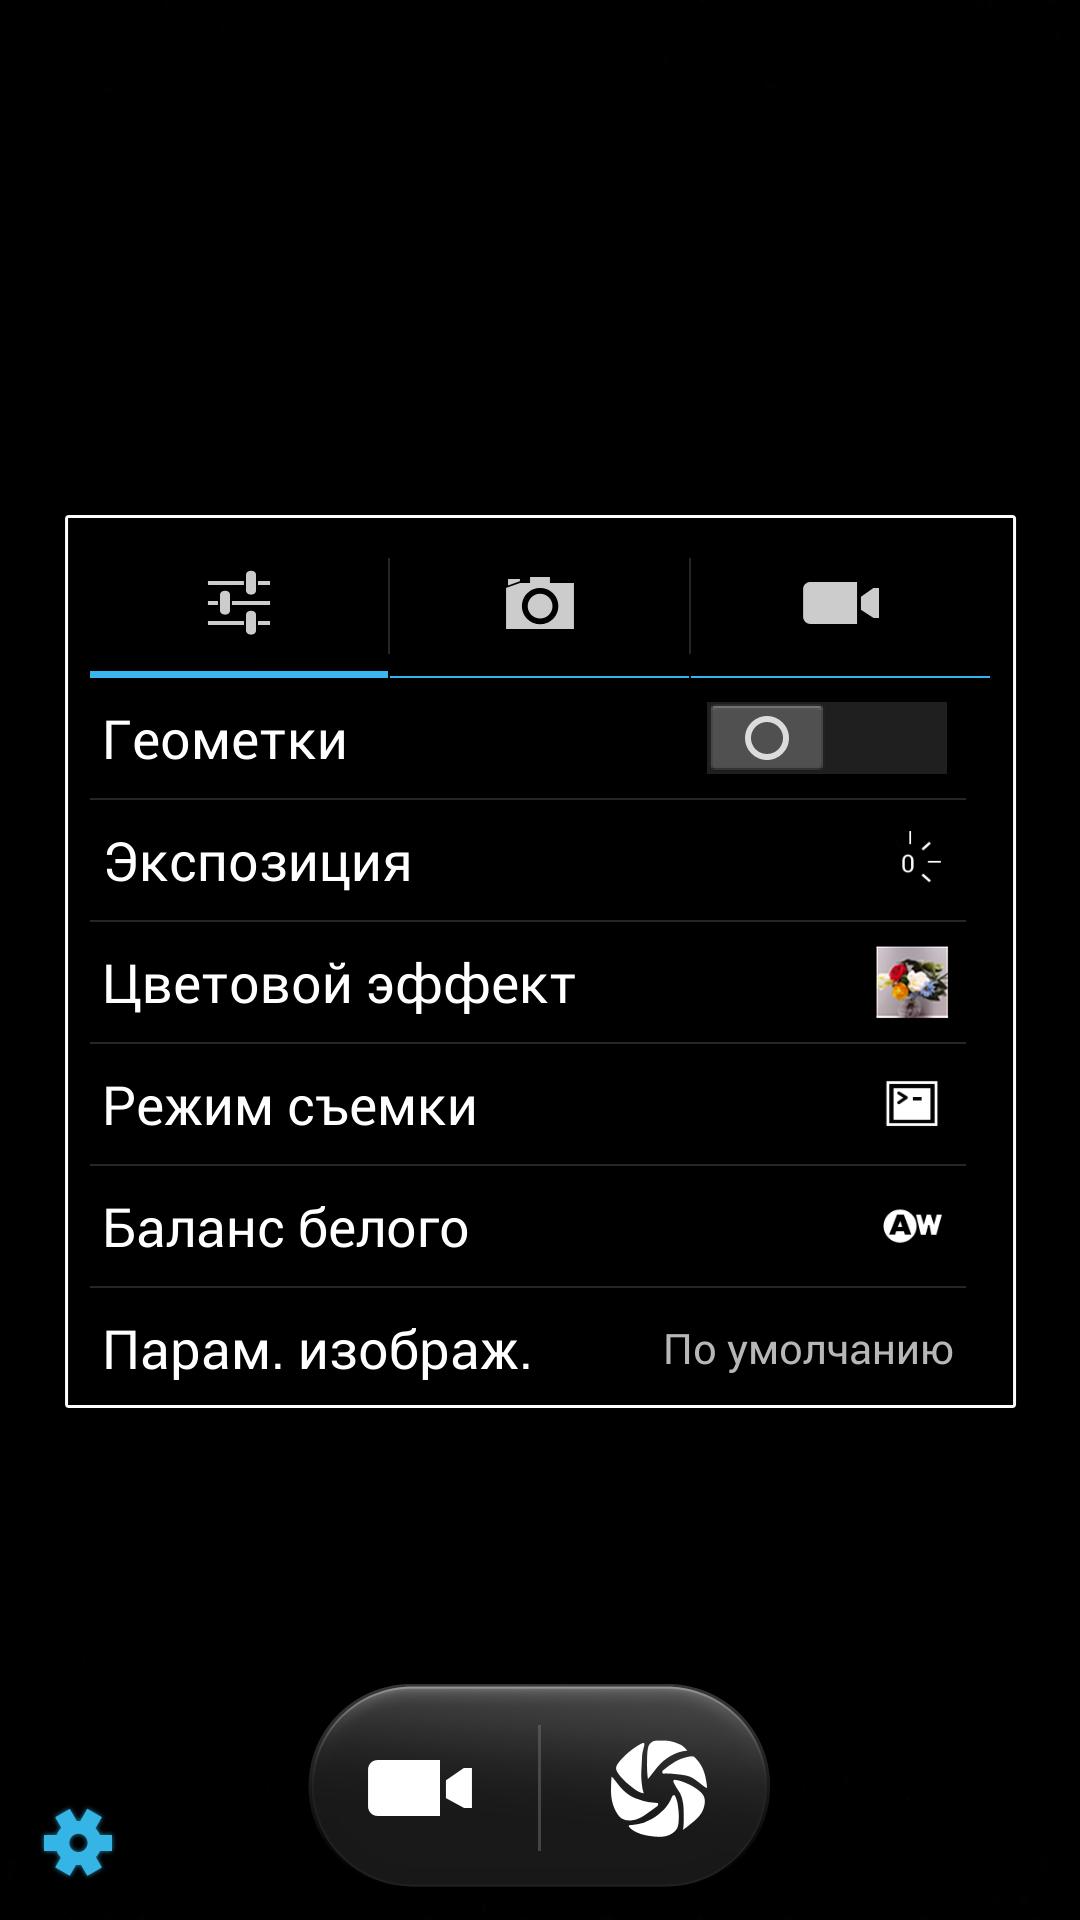 Screenshot_2014-07-11-19-59-28